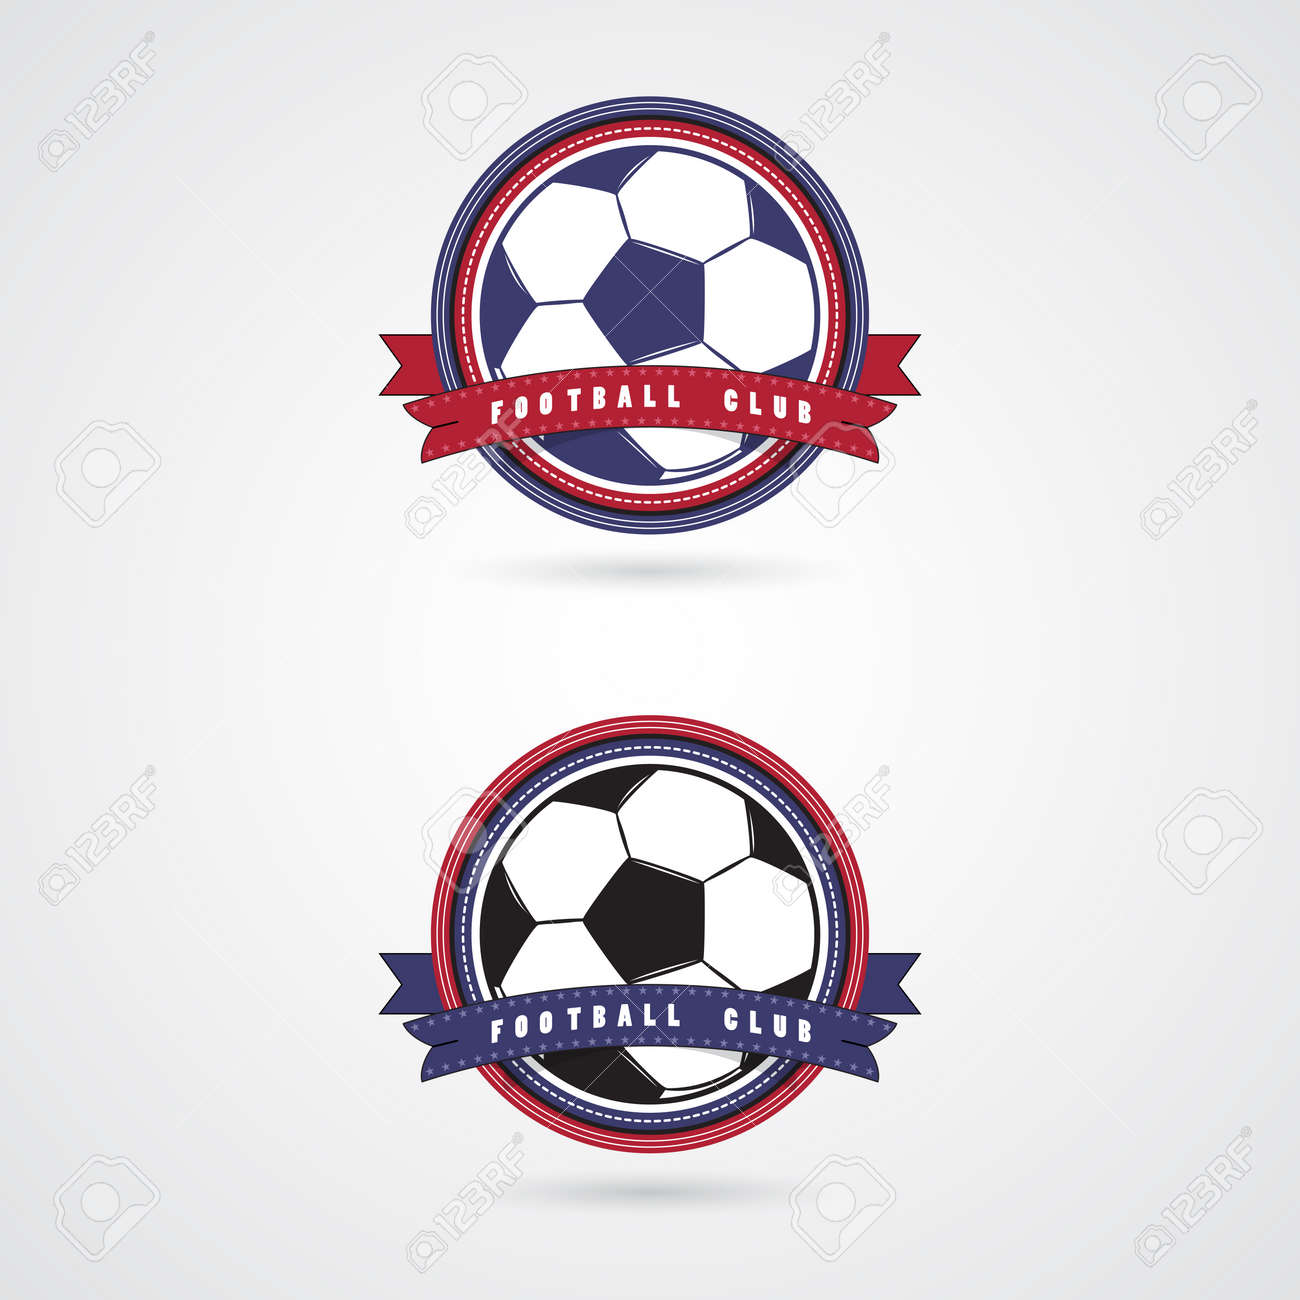 Design t shirt soccer - Soccer Football Badge Logo Design Templates Sport Team Identity Collection Of Soccer Themed T